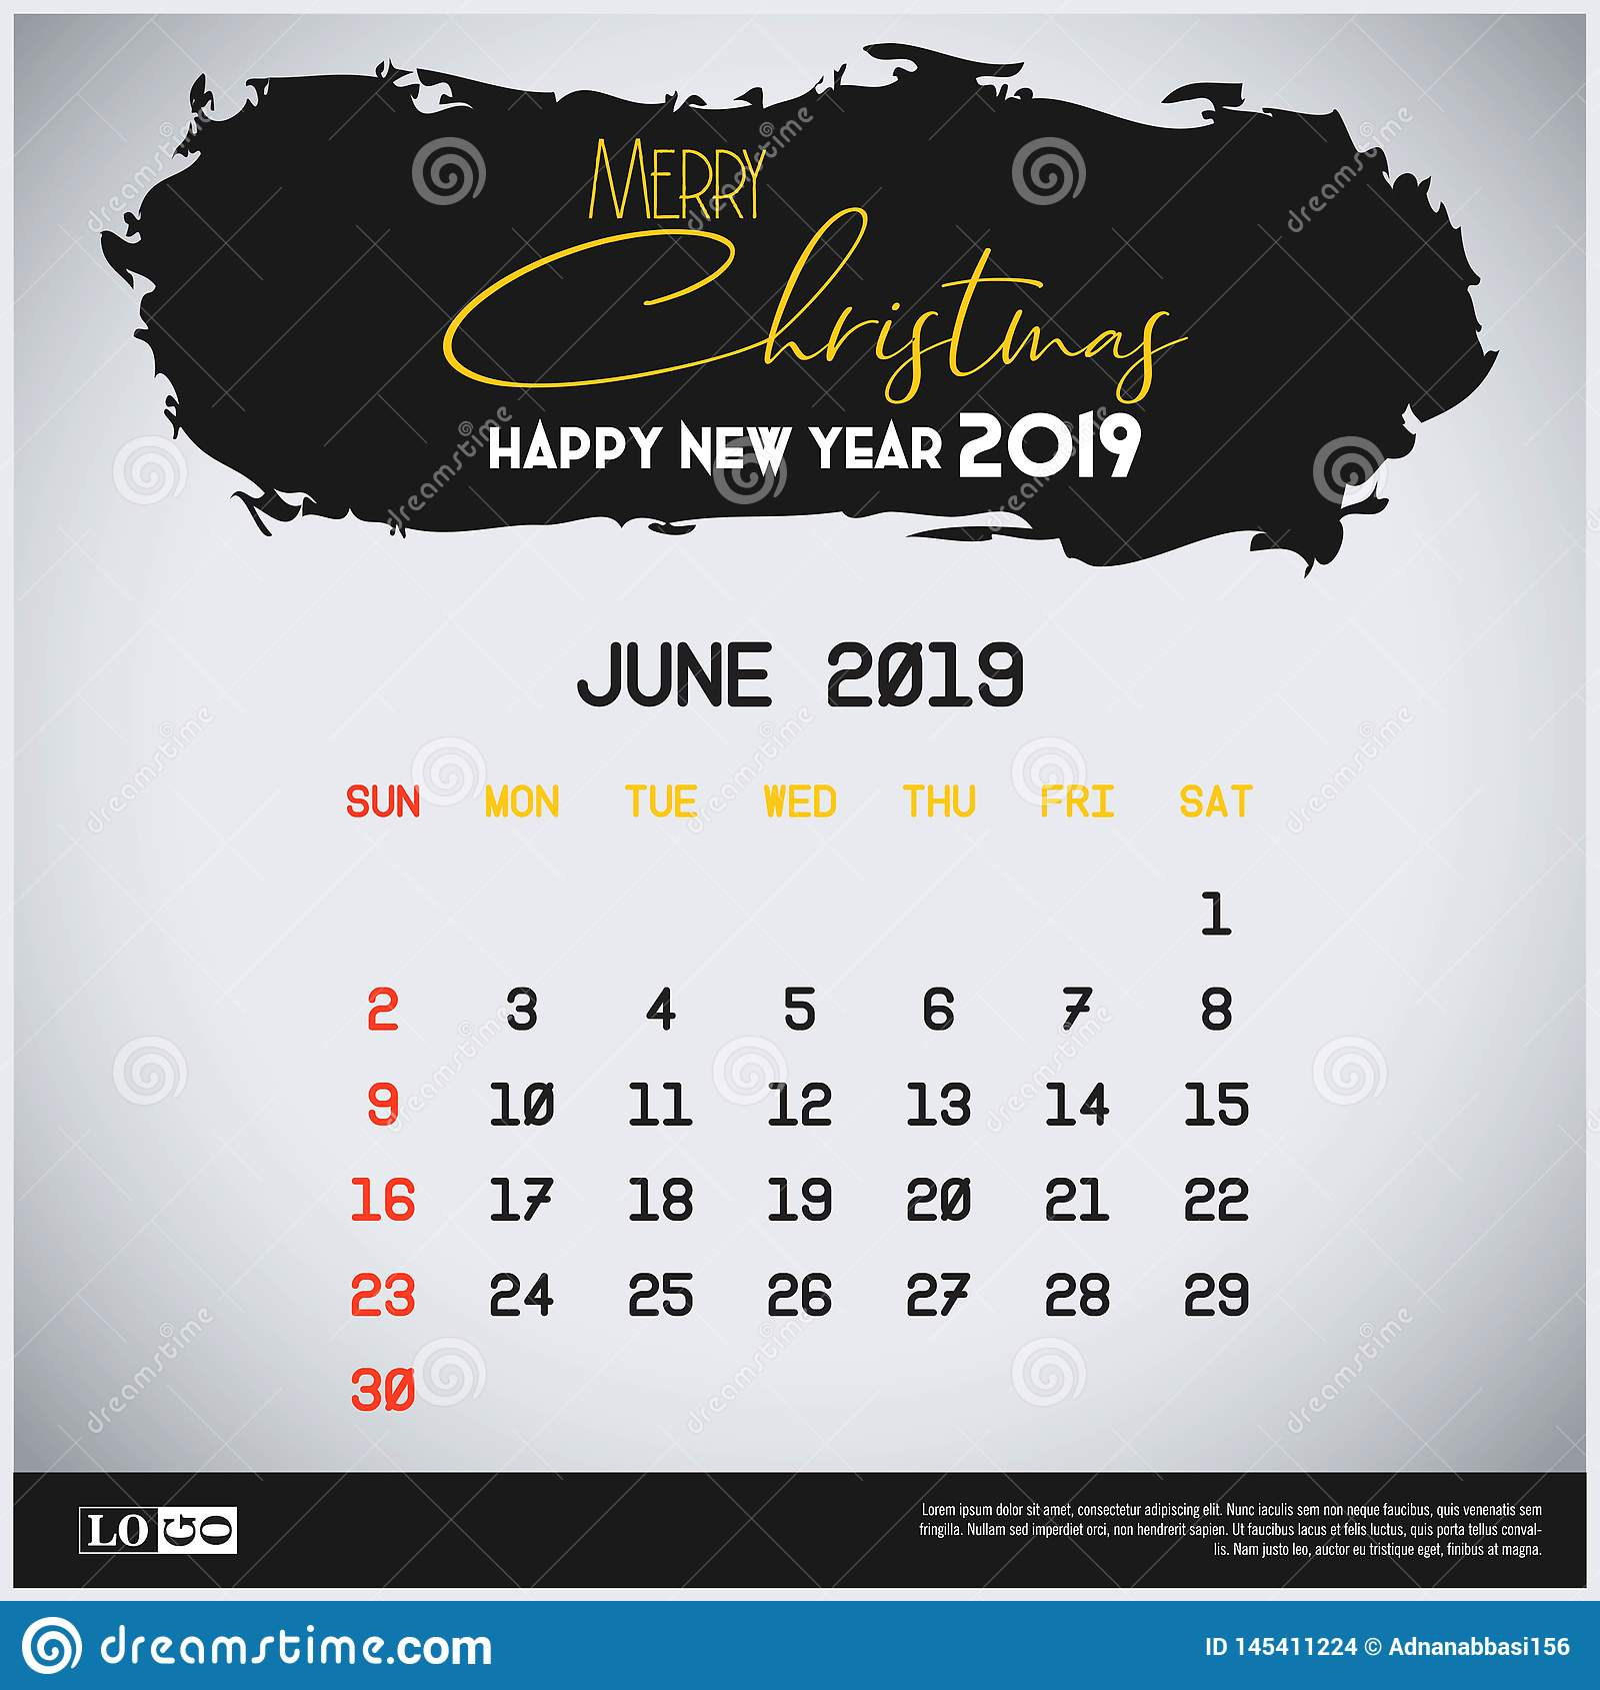 Шаблон календаря Нового Года июня 2019 r